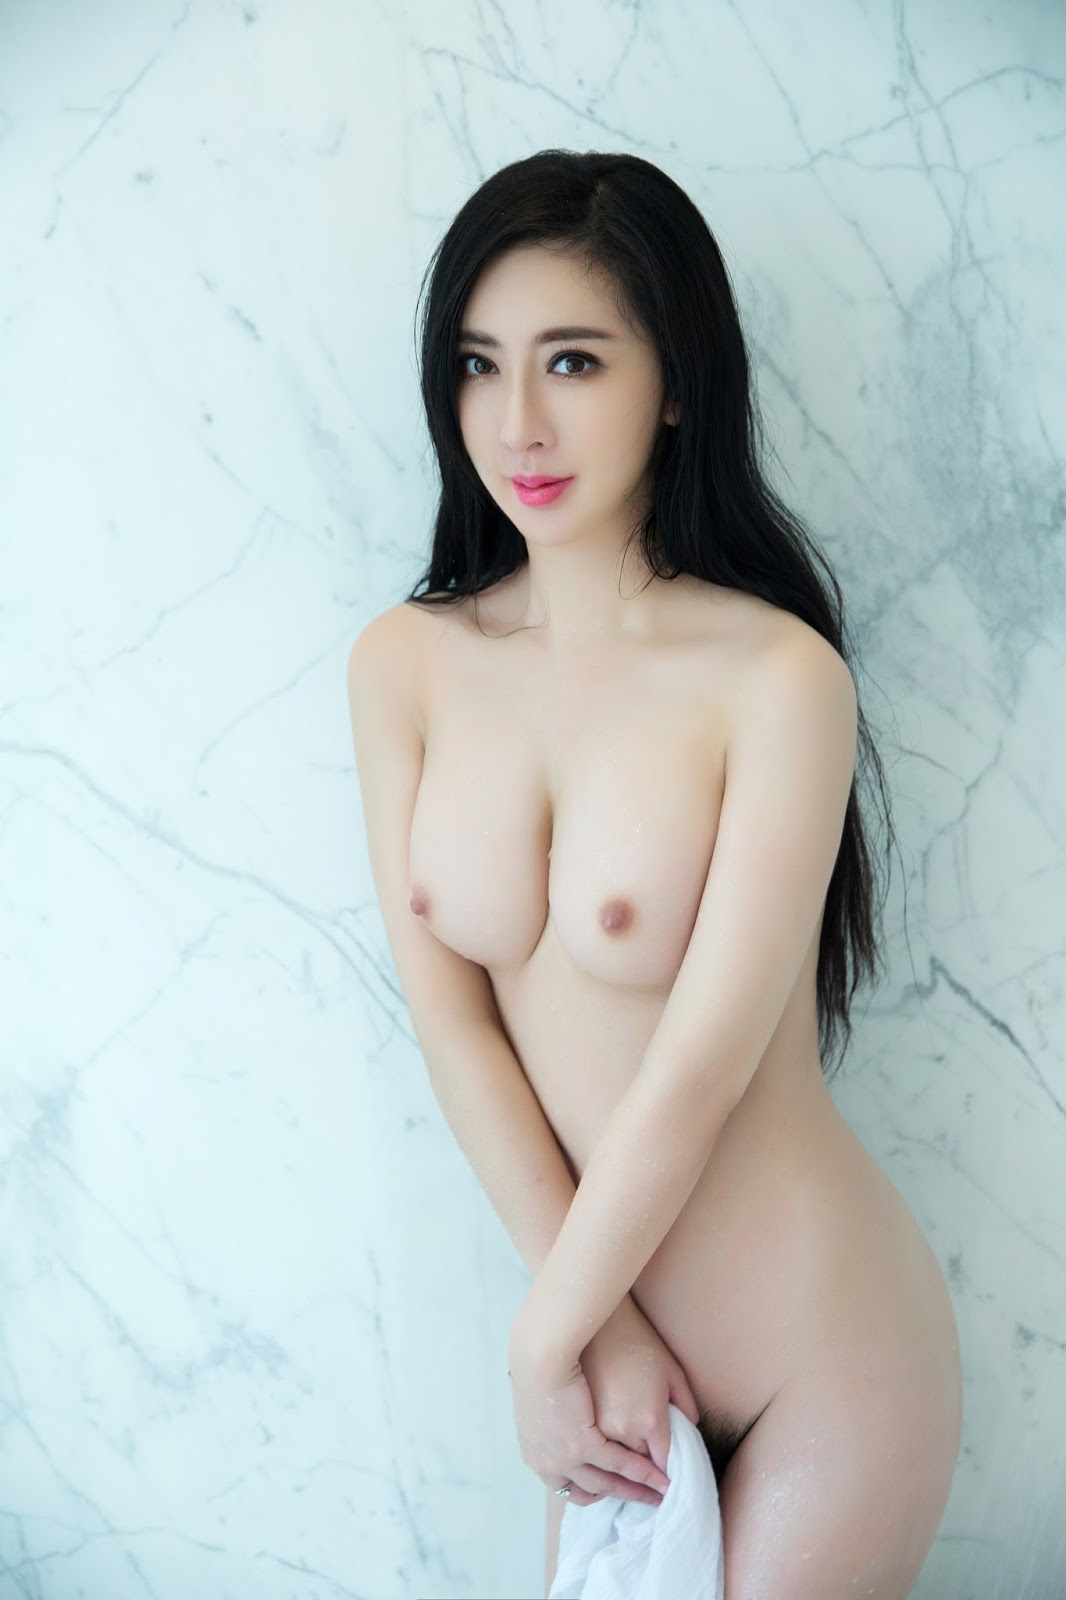 Beautiful Sexy Chinese Model Lilisha Naked Pose Exotic Asian Girls